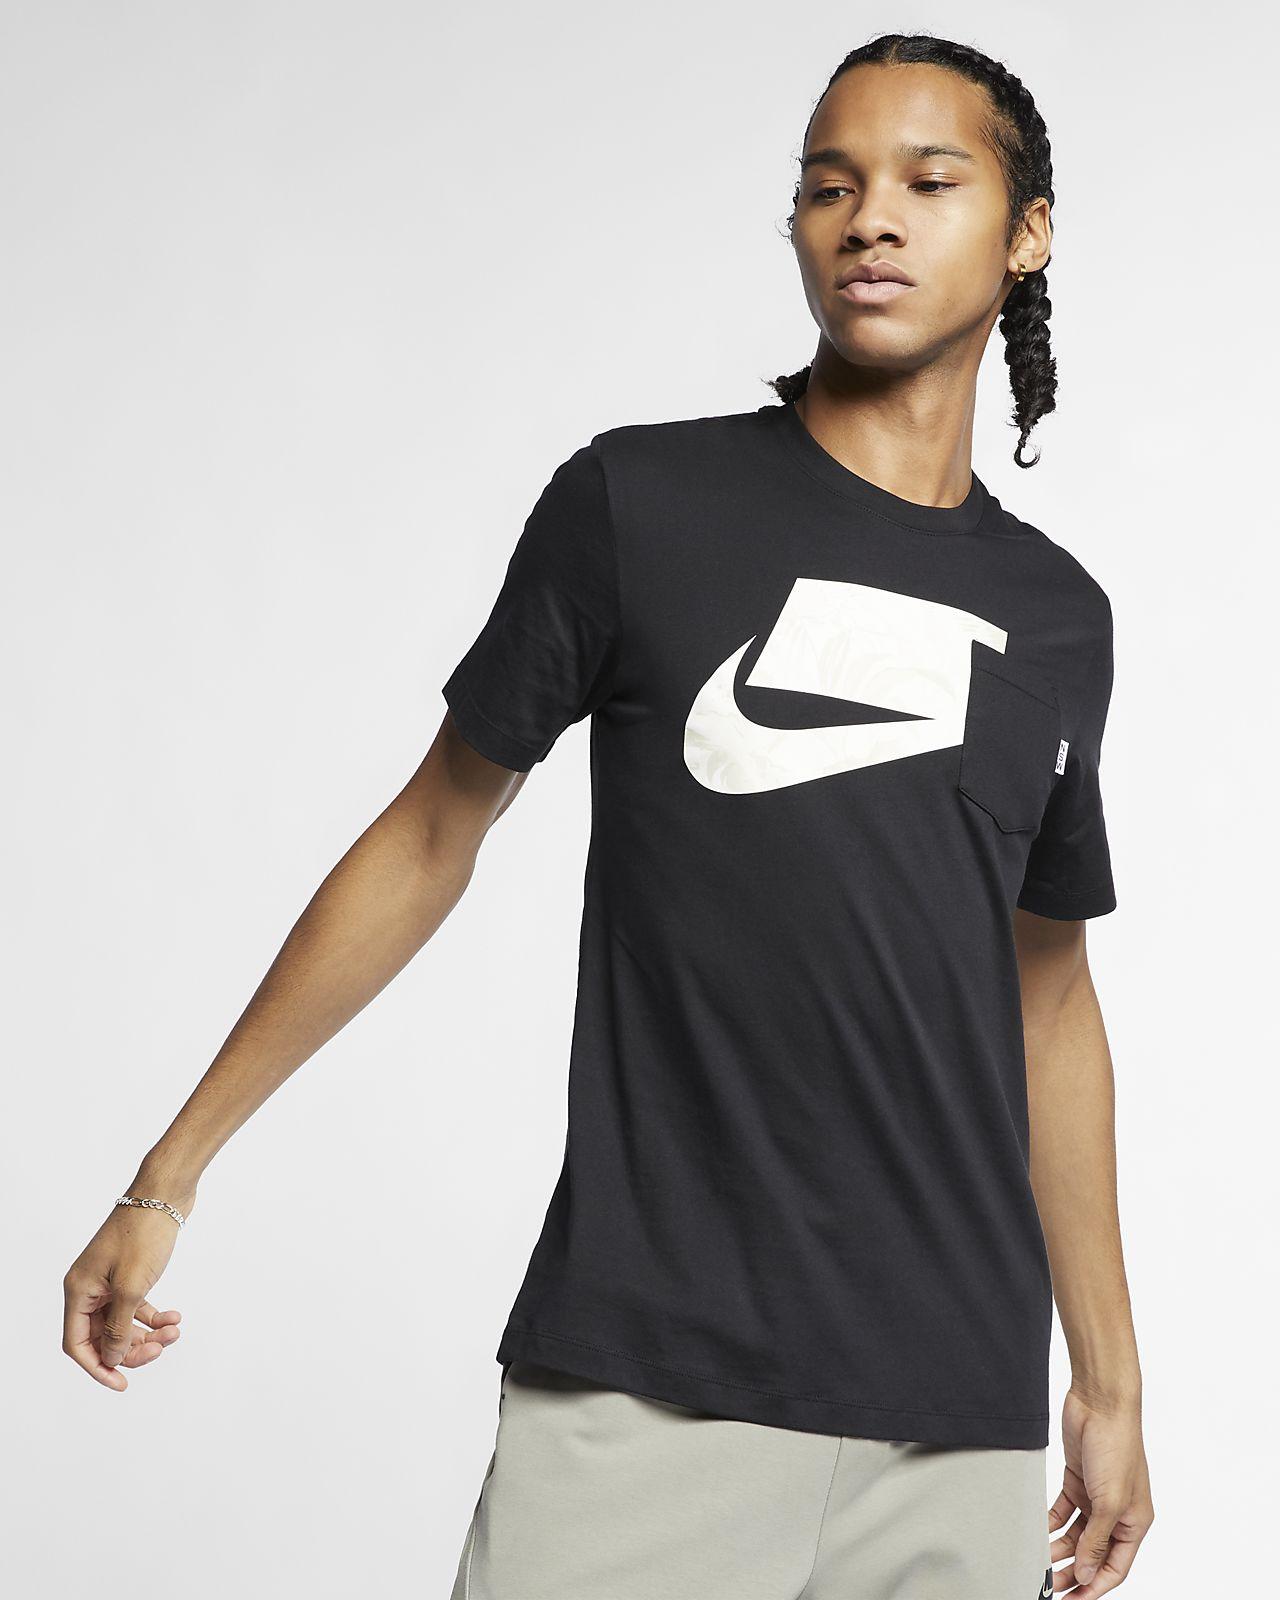 95118306 Nike Sportswear NSW Men's T-Shirt. Nike.com ID